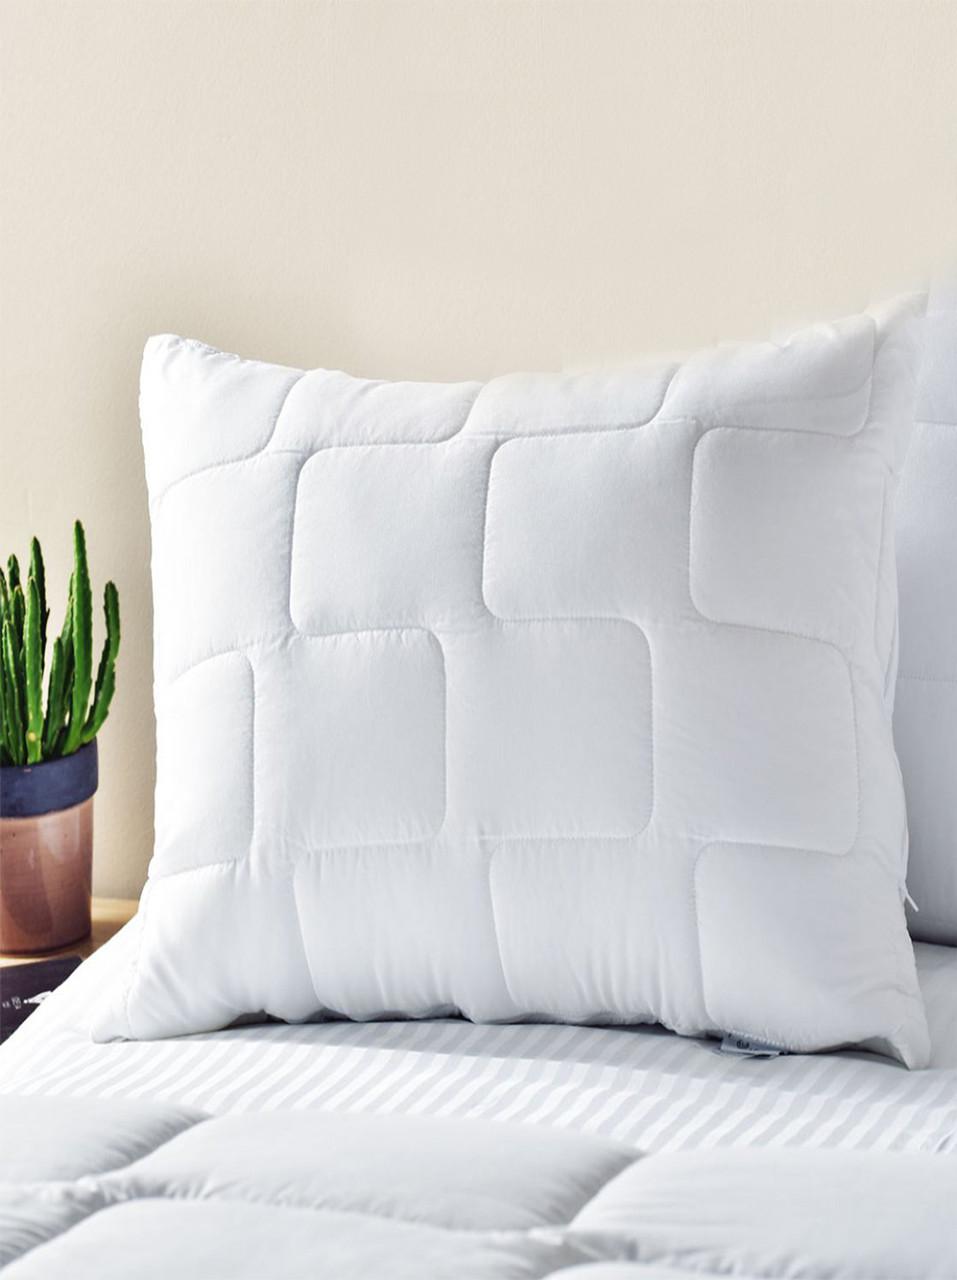 Подушка  70х70, стеганый чехол на молнии + внутренняя подушка